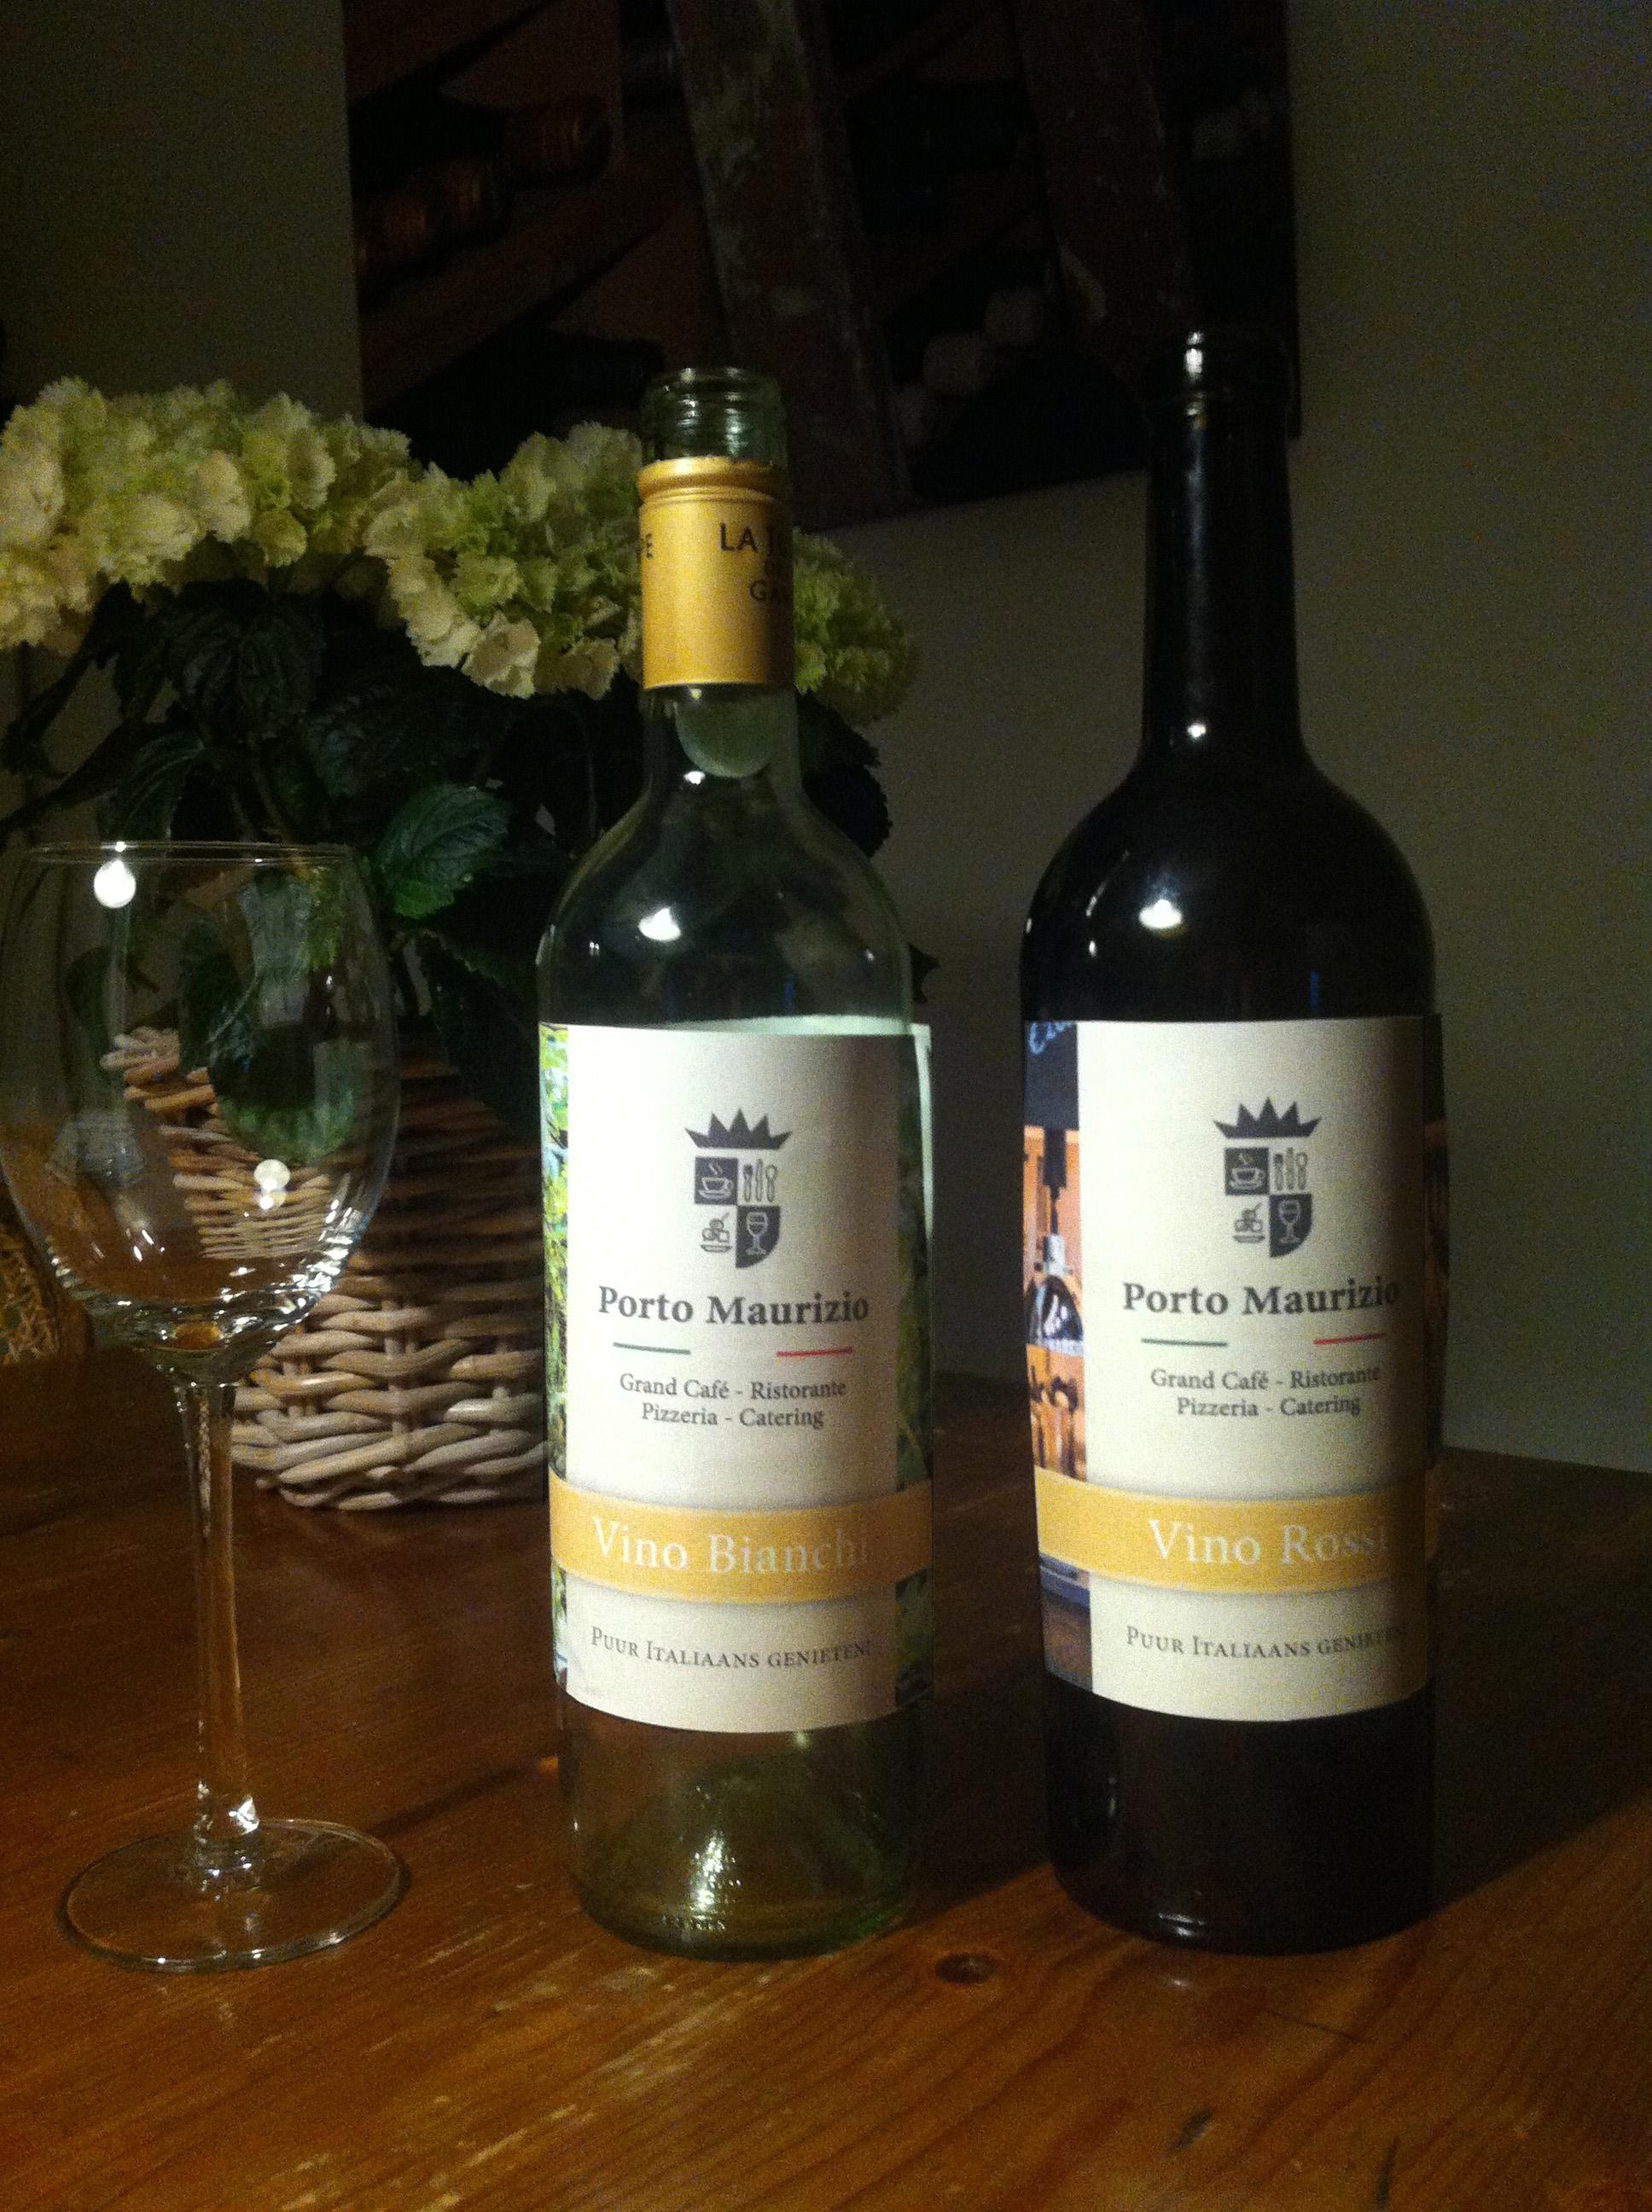 Wijn etiketten - Porto Maurizio